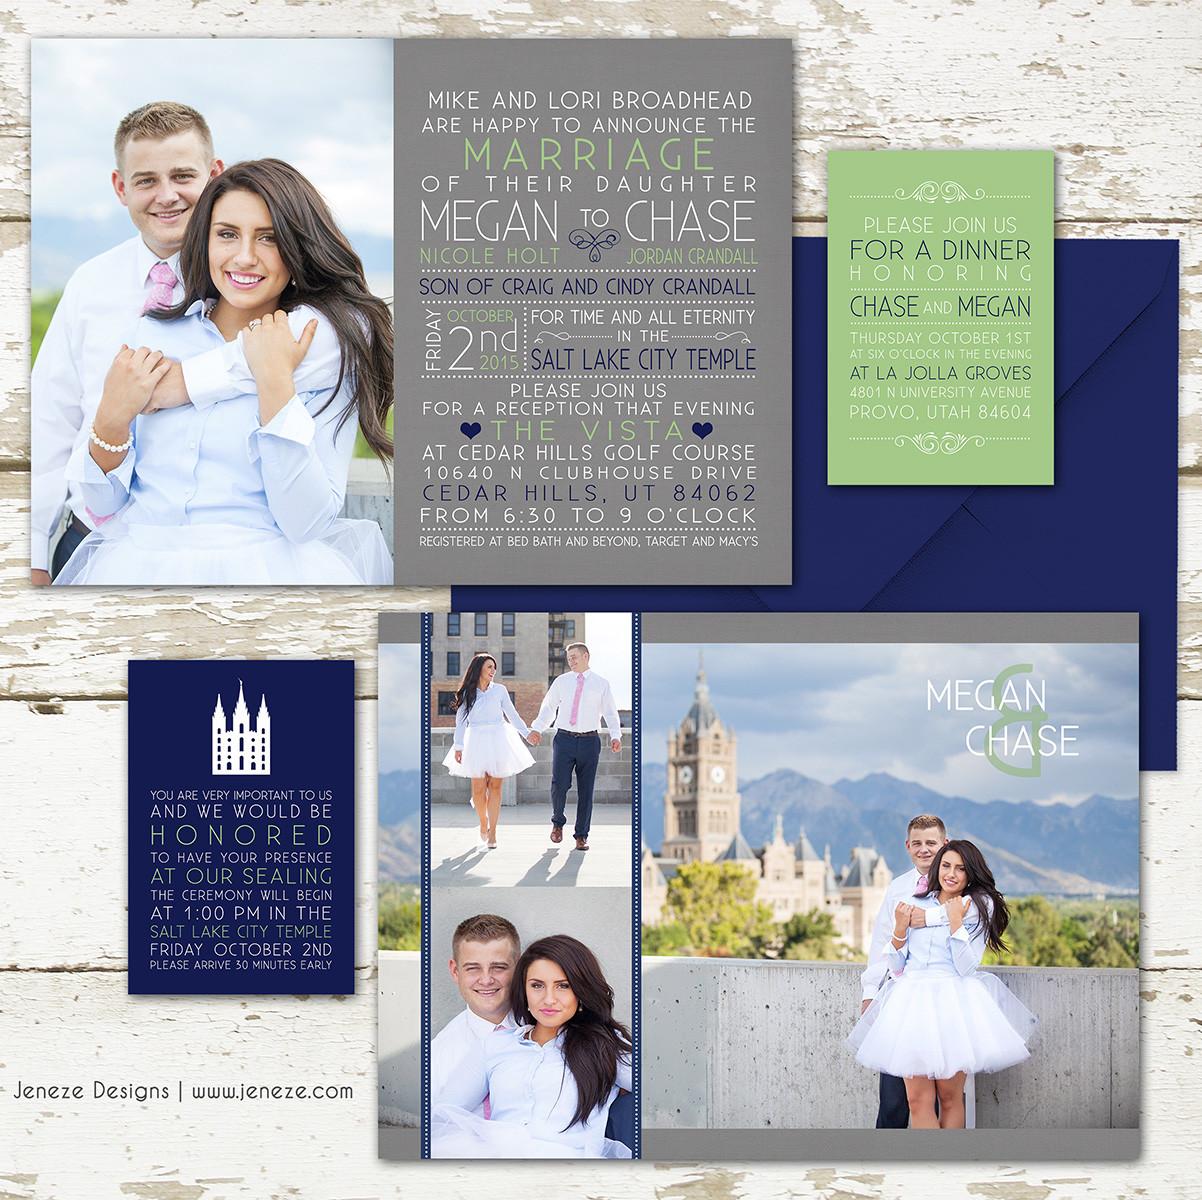 Jeneze designs custom wedding invitations photo invitations photo invitation item ca241 monicamarmolfo Images